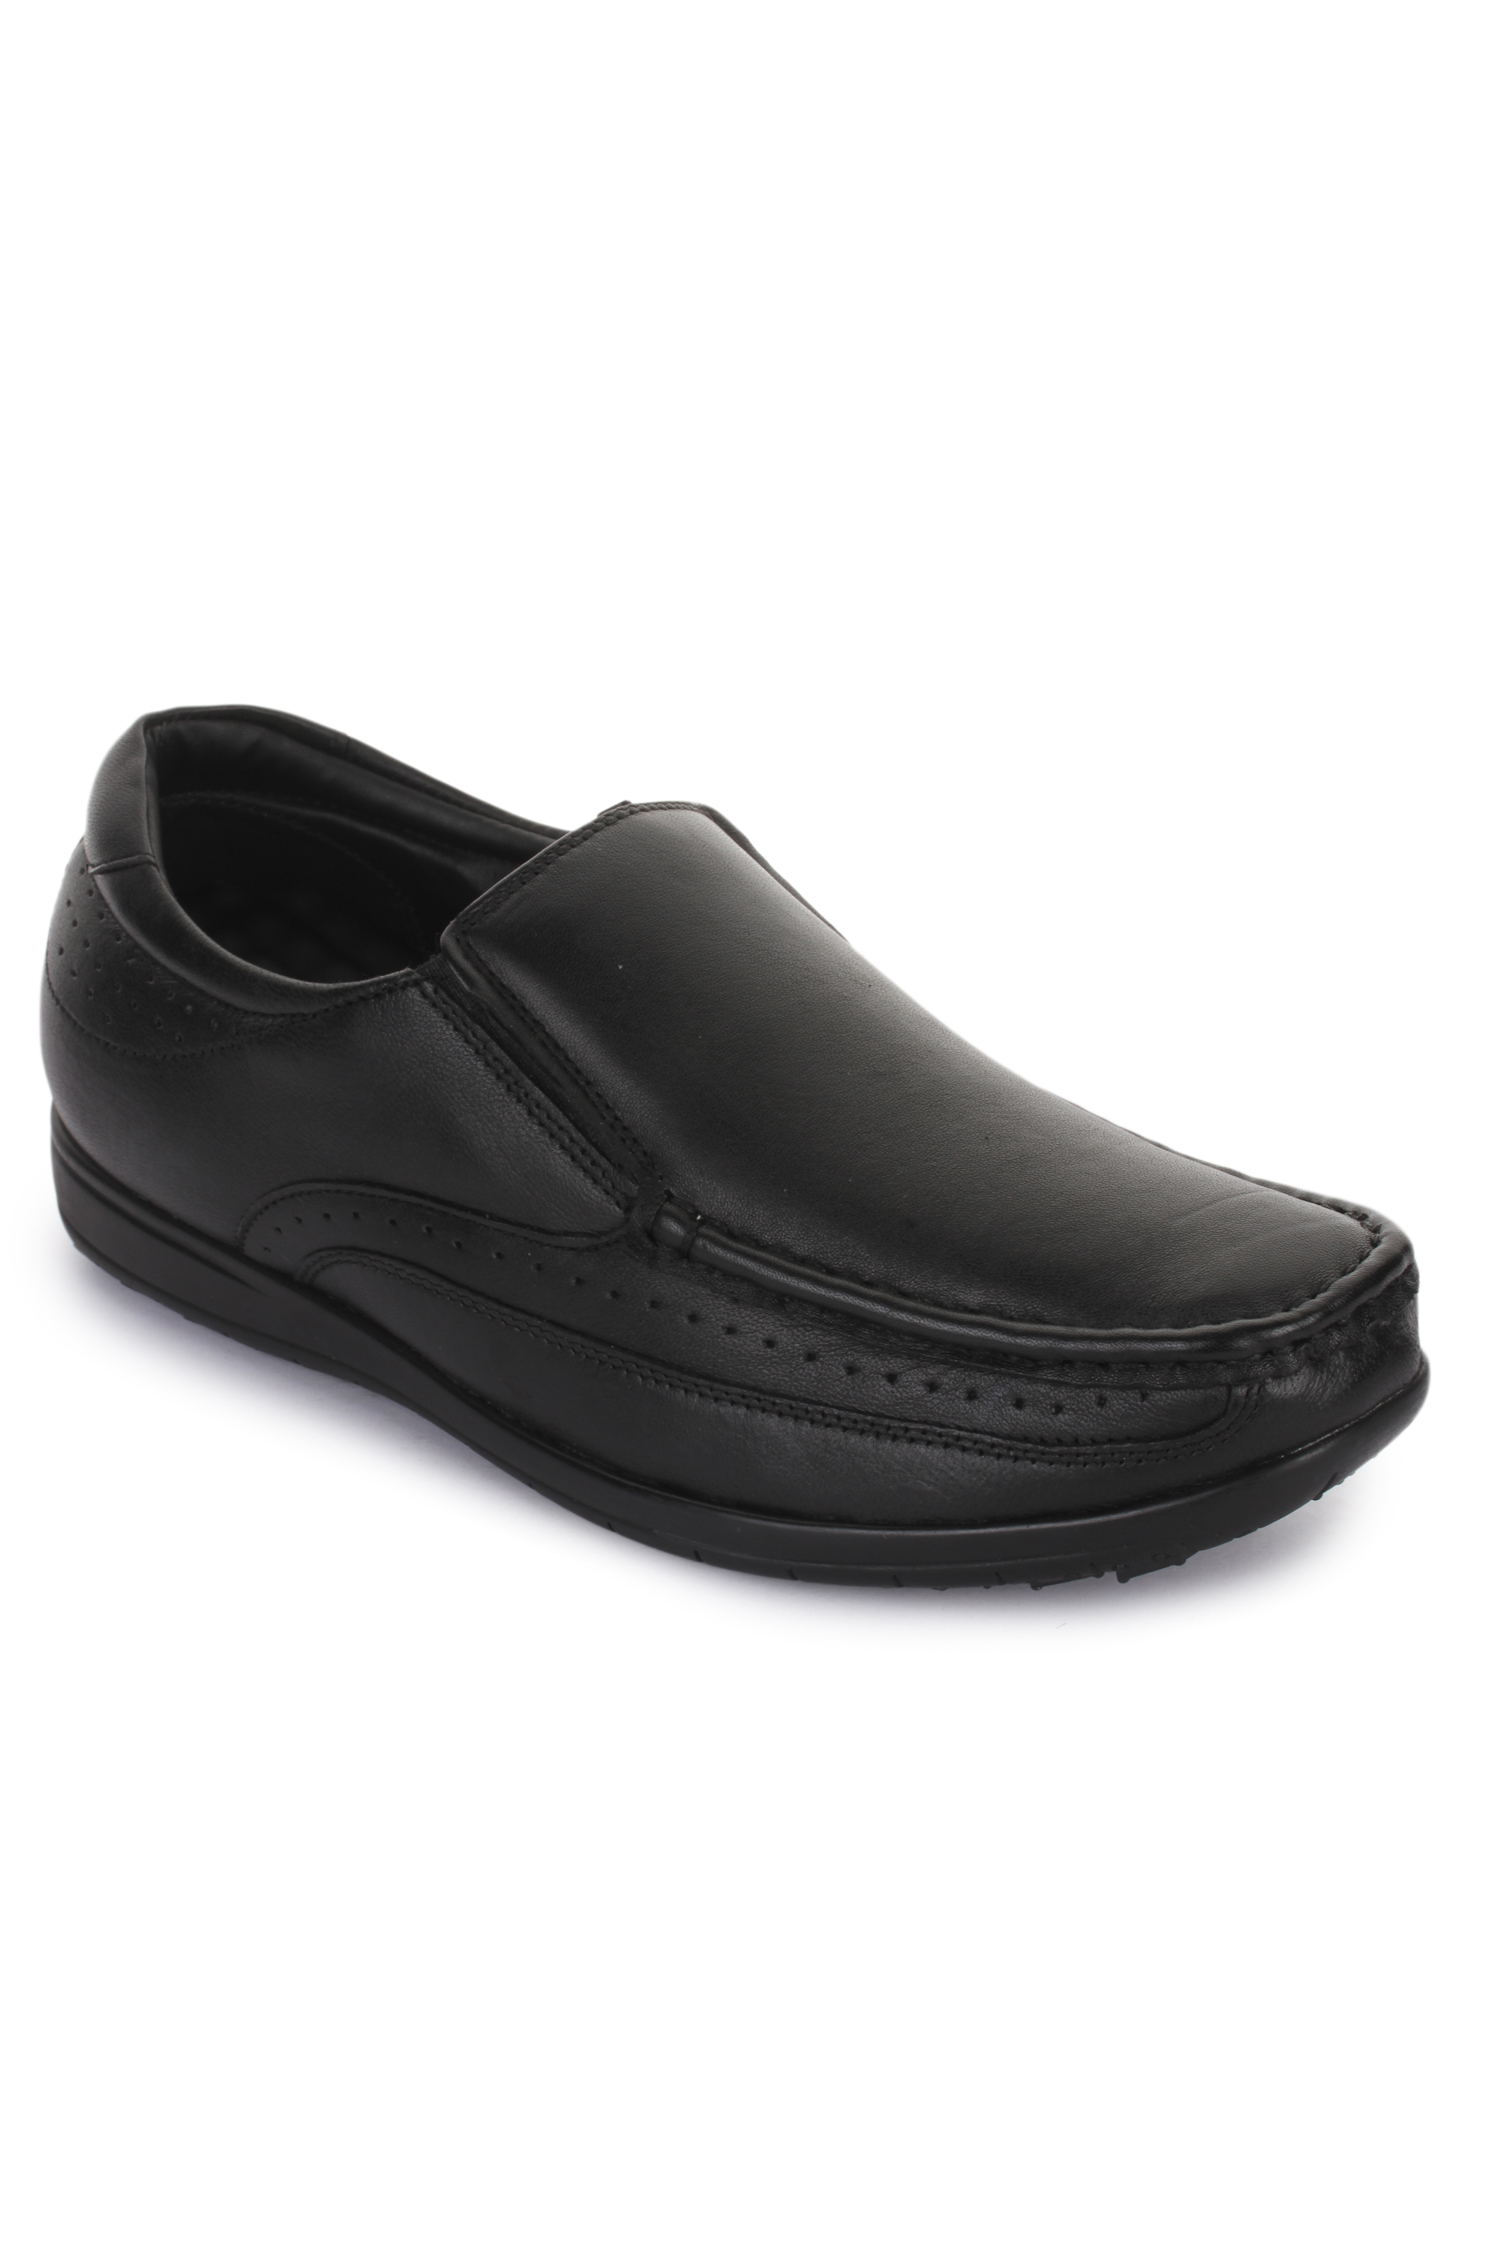 Liberty   Liberty Healers Black Formal Oxfords Shoes FL-1415_Black For - Men